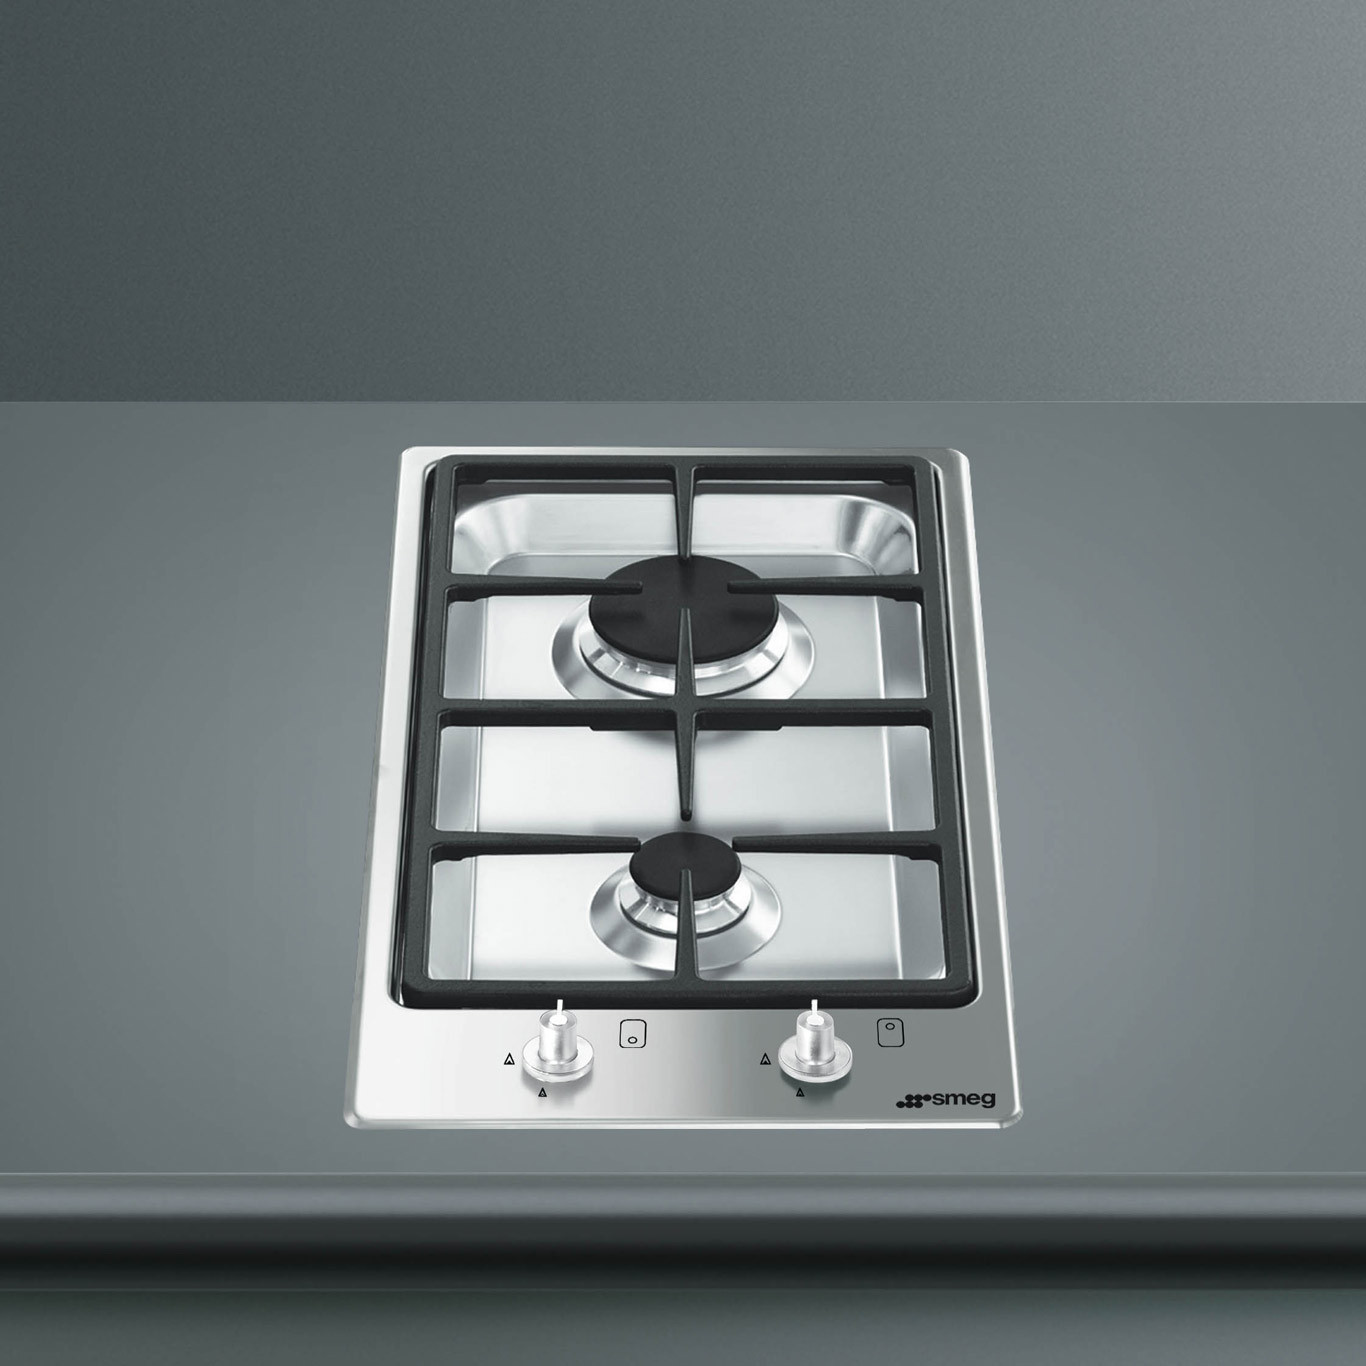 Old Fashioned Kitchen Hob ~ Buy smeg classic cm burner domino gas hob pgf g